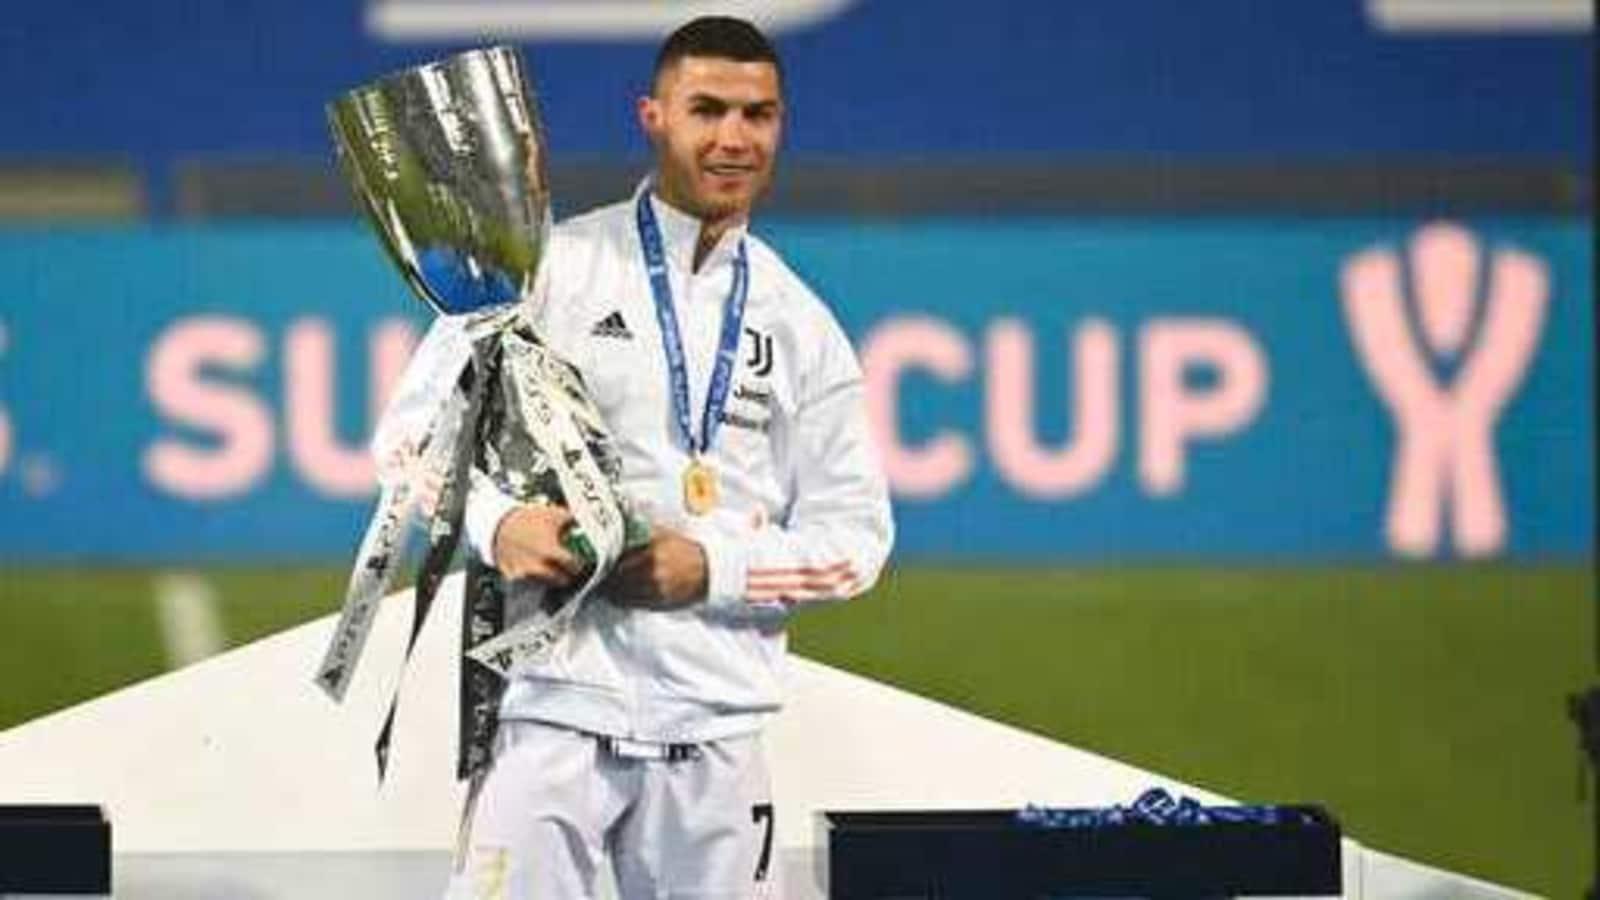 Ronaldo helps Juventus beat Napoli to win Italian Super Cup